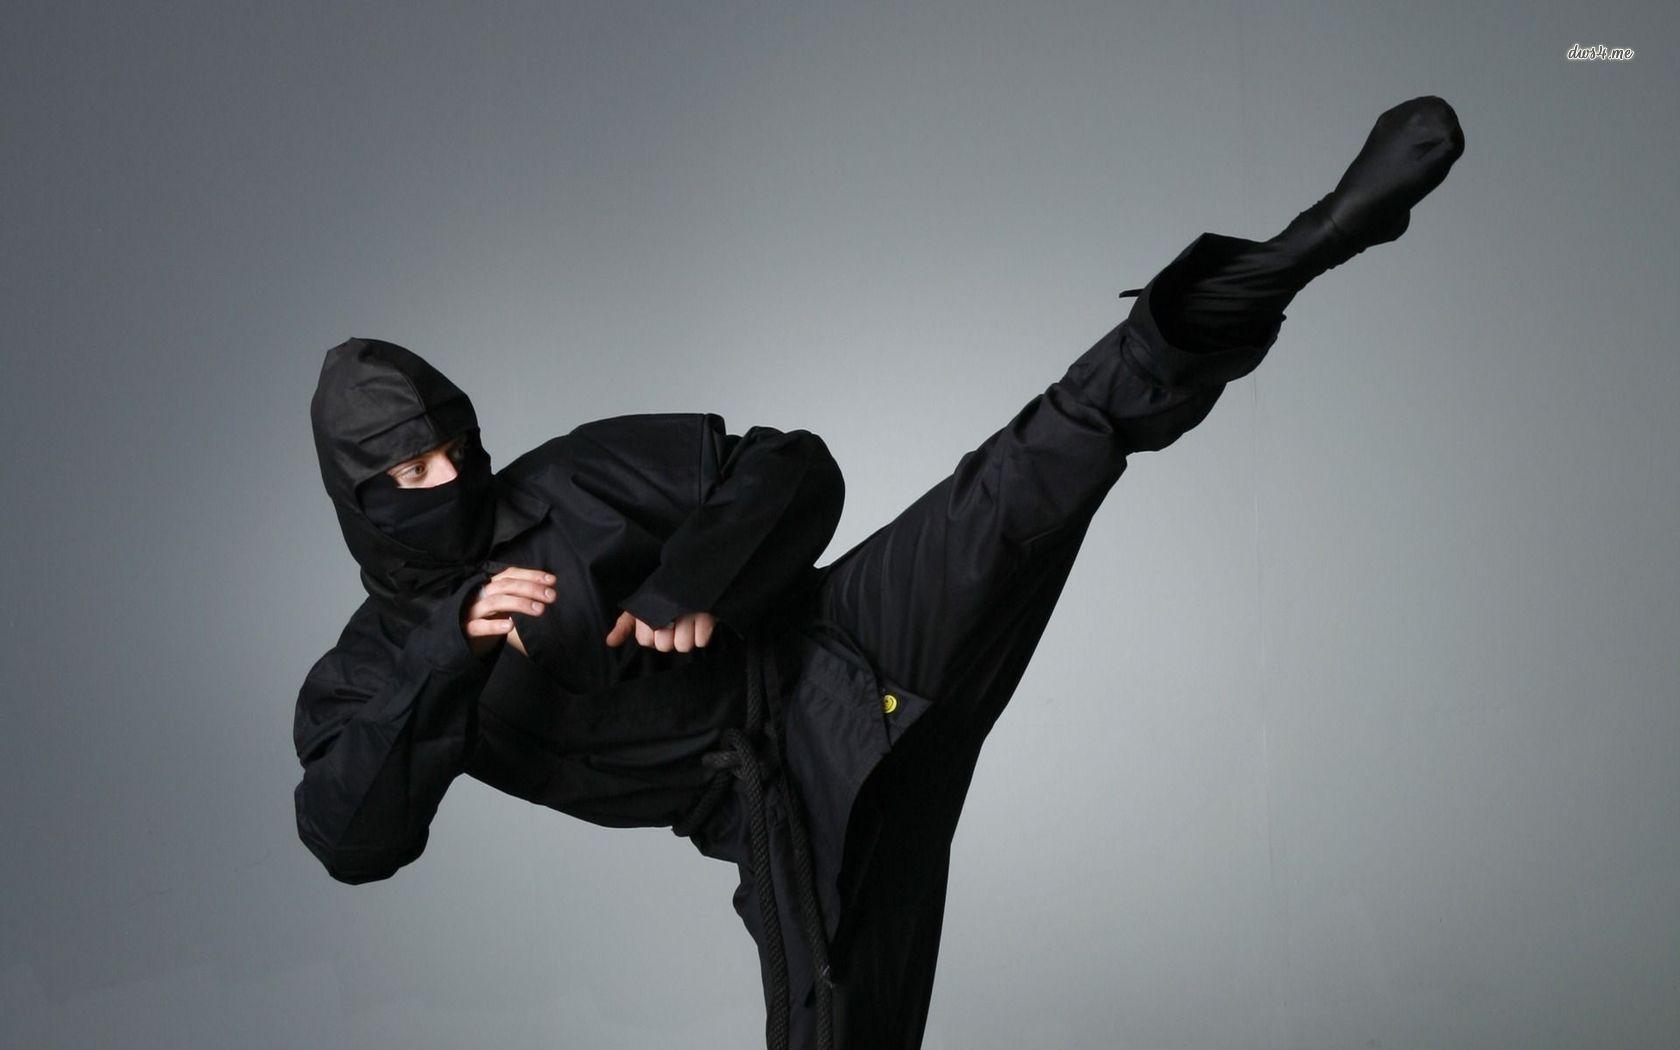 Free Ninja Wallpapers Download